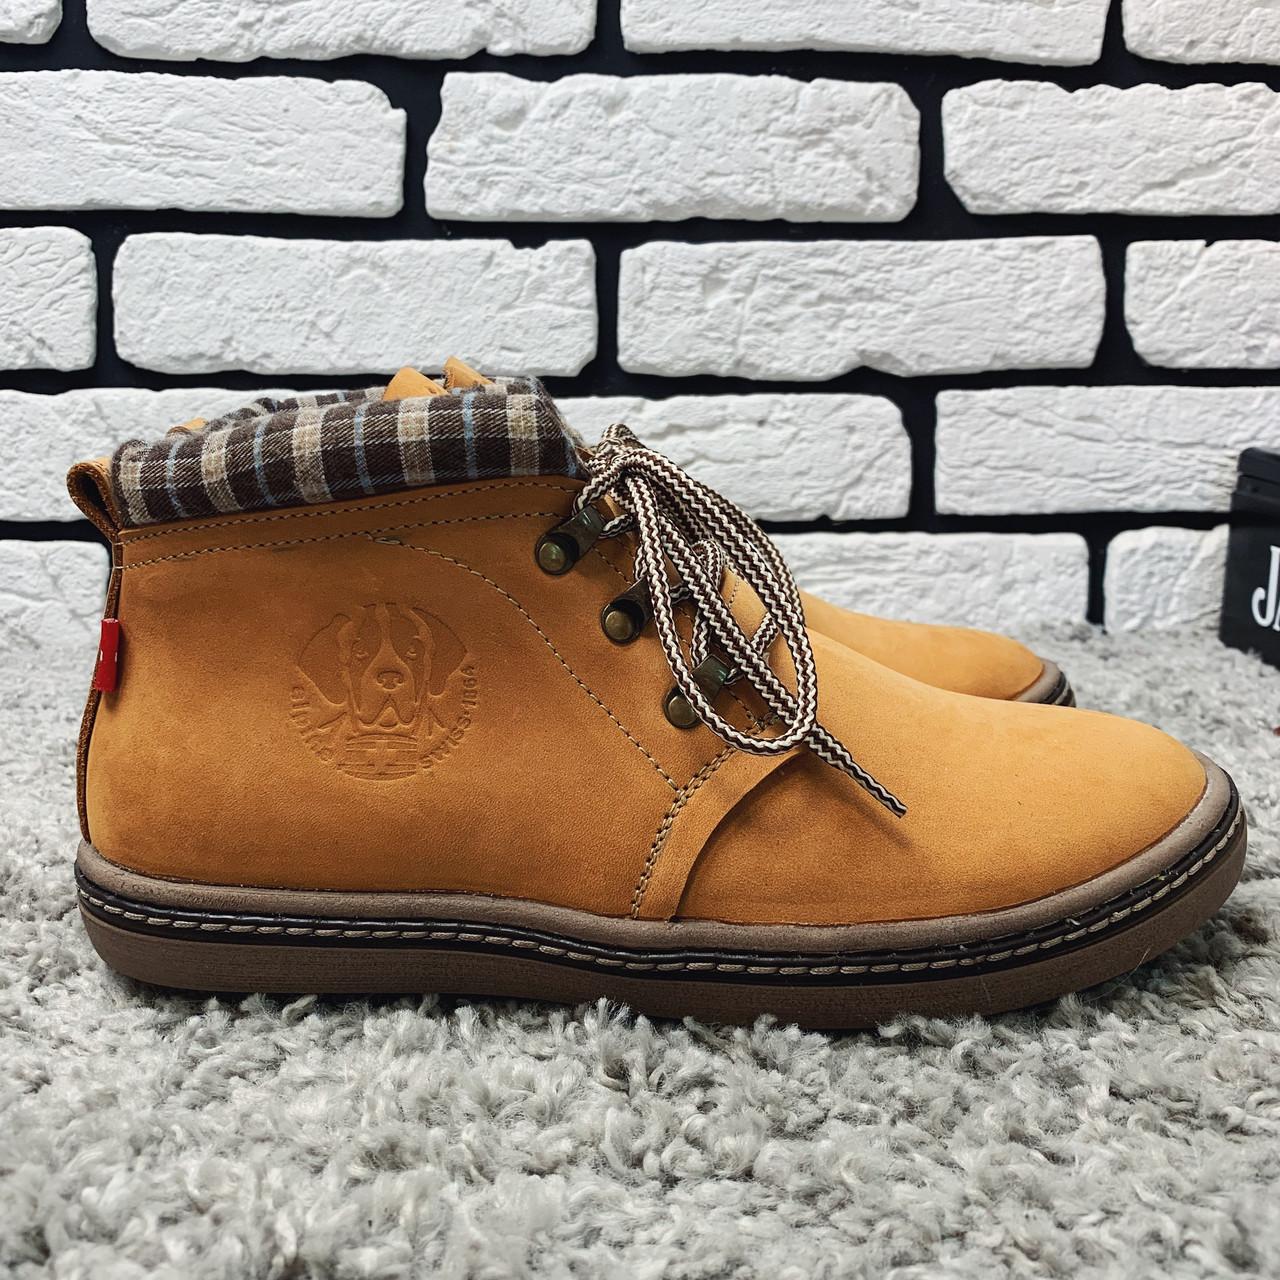 Зимние ботинки (на меху) мужские Switzerland 13035 ⏩ [ 41,41,42,43,43,43]